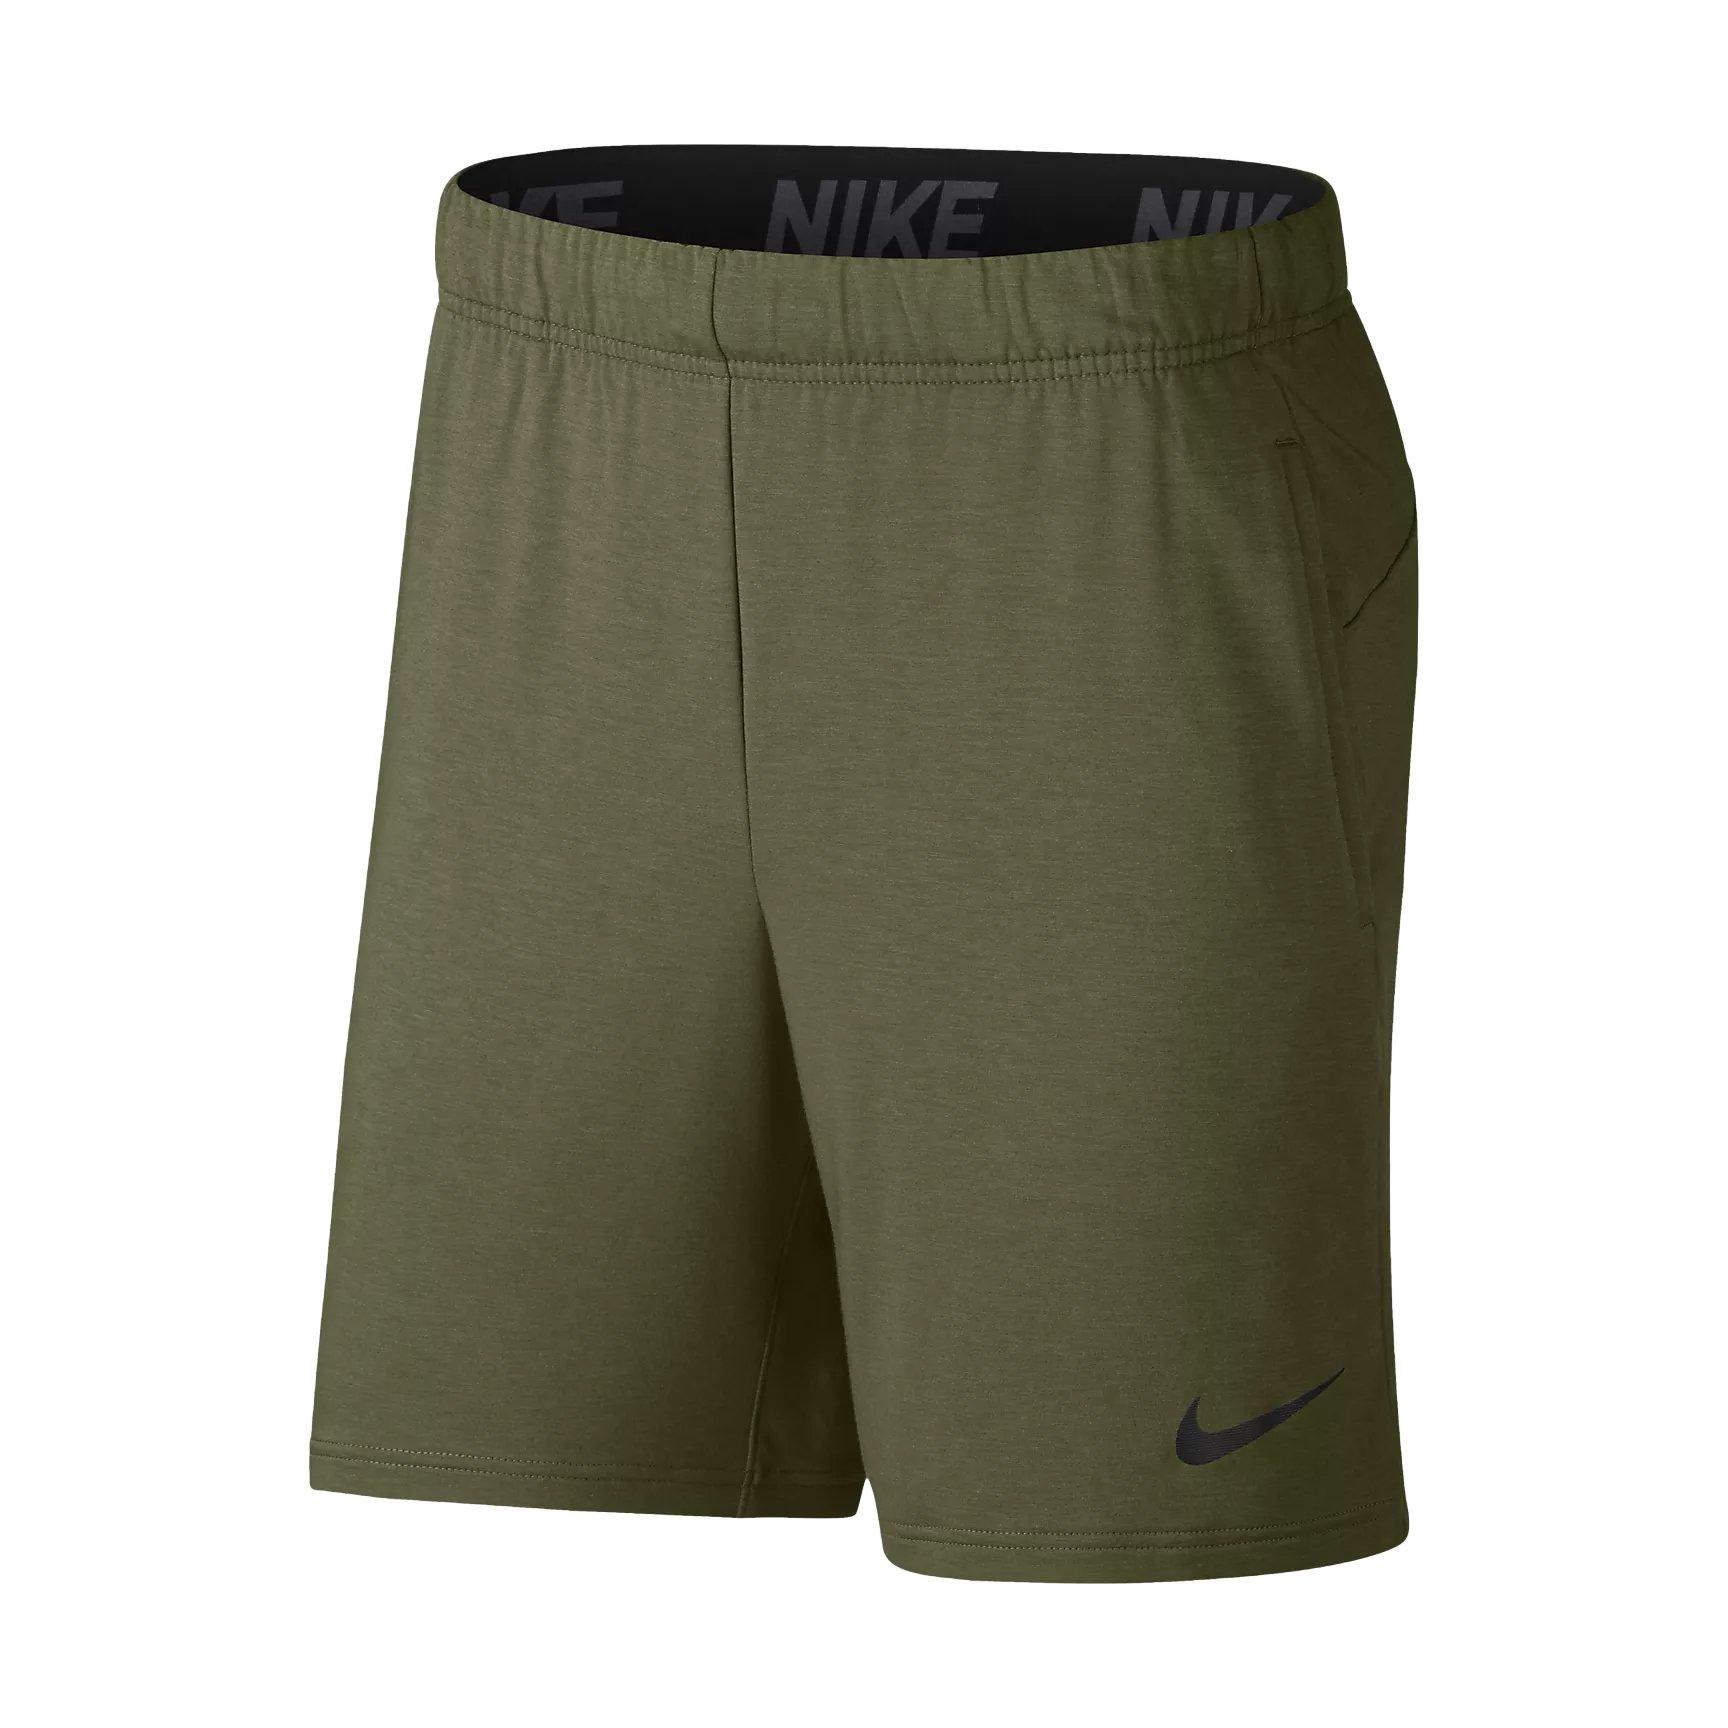 Nike Dri-FIT Men's 8'' (20.5cm Approx.) Training Shorts (Olive Canvas/Pure/Black, XXL)